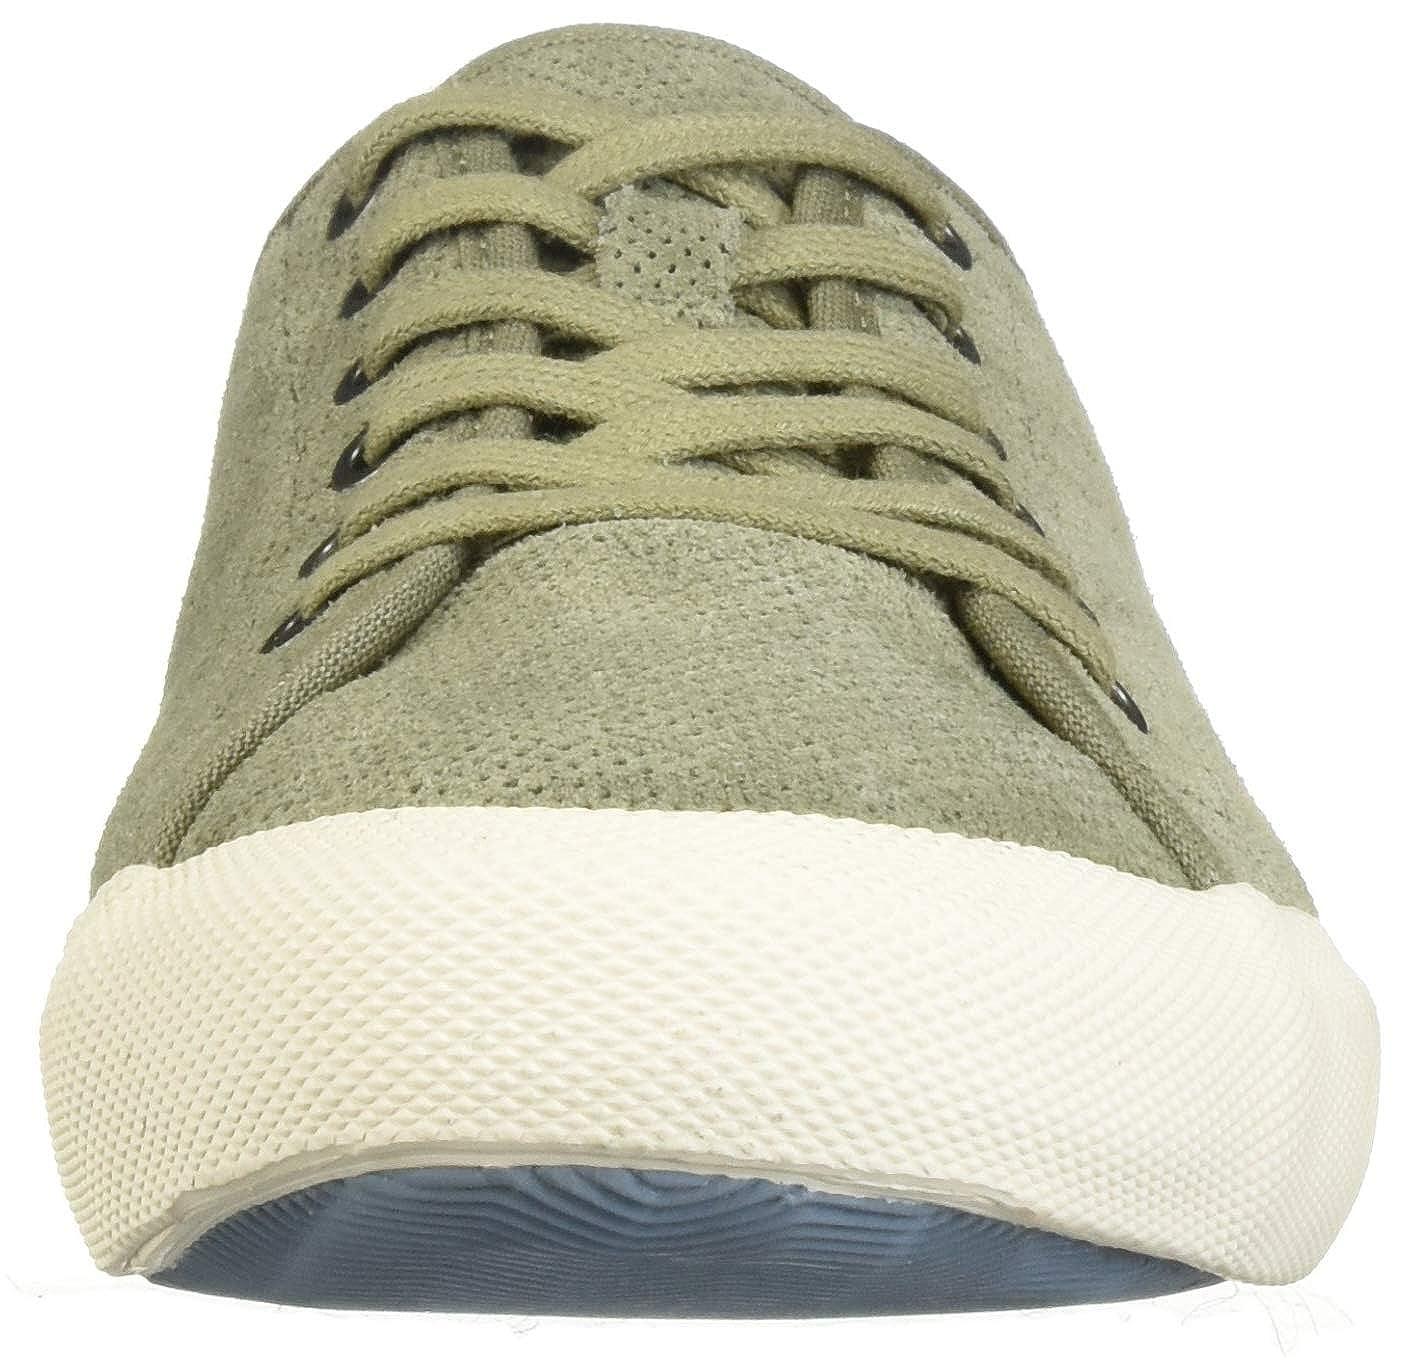 SeaVees Women's Women's Women's Monterey Sneaker Varsity B07BRYCBG9 Fashion Sneakers 961465